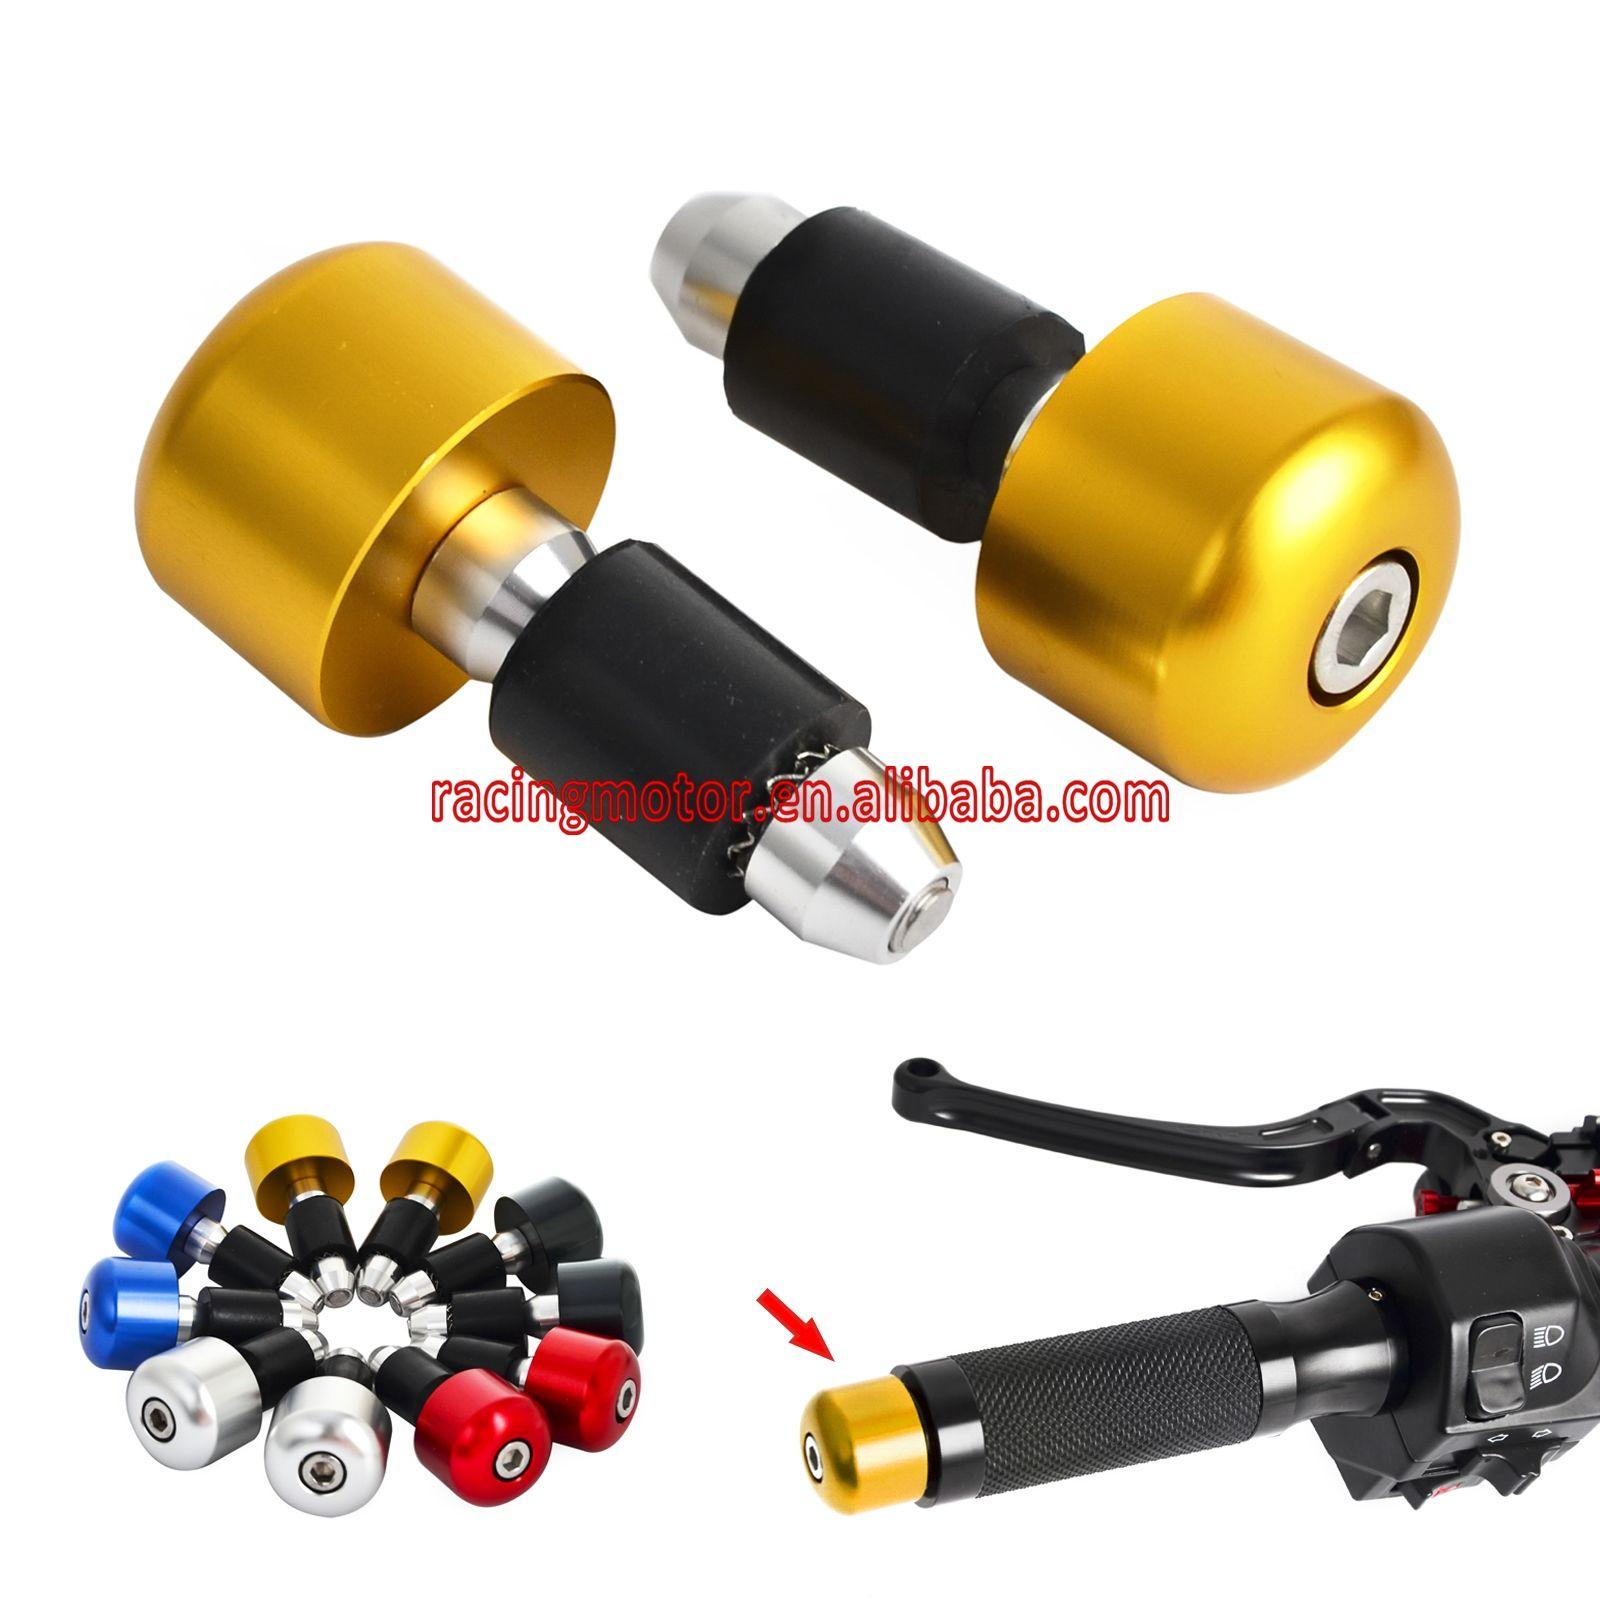 22mm 7 8 Handlebar Cap Bar Ends For Suzuki Gsf400 Gsf600 Gsf650 Gsf1200 Gsf1250 Bandit Dl650 Dl1000 V Strom 1000 D Handlebar Motorcycle Accessories V Strom